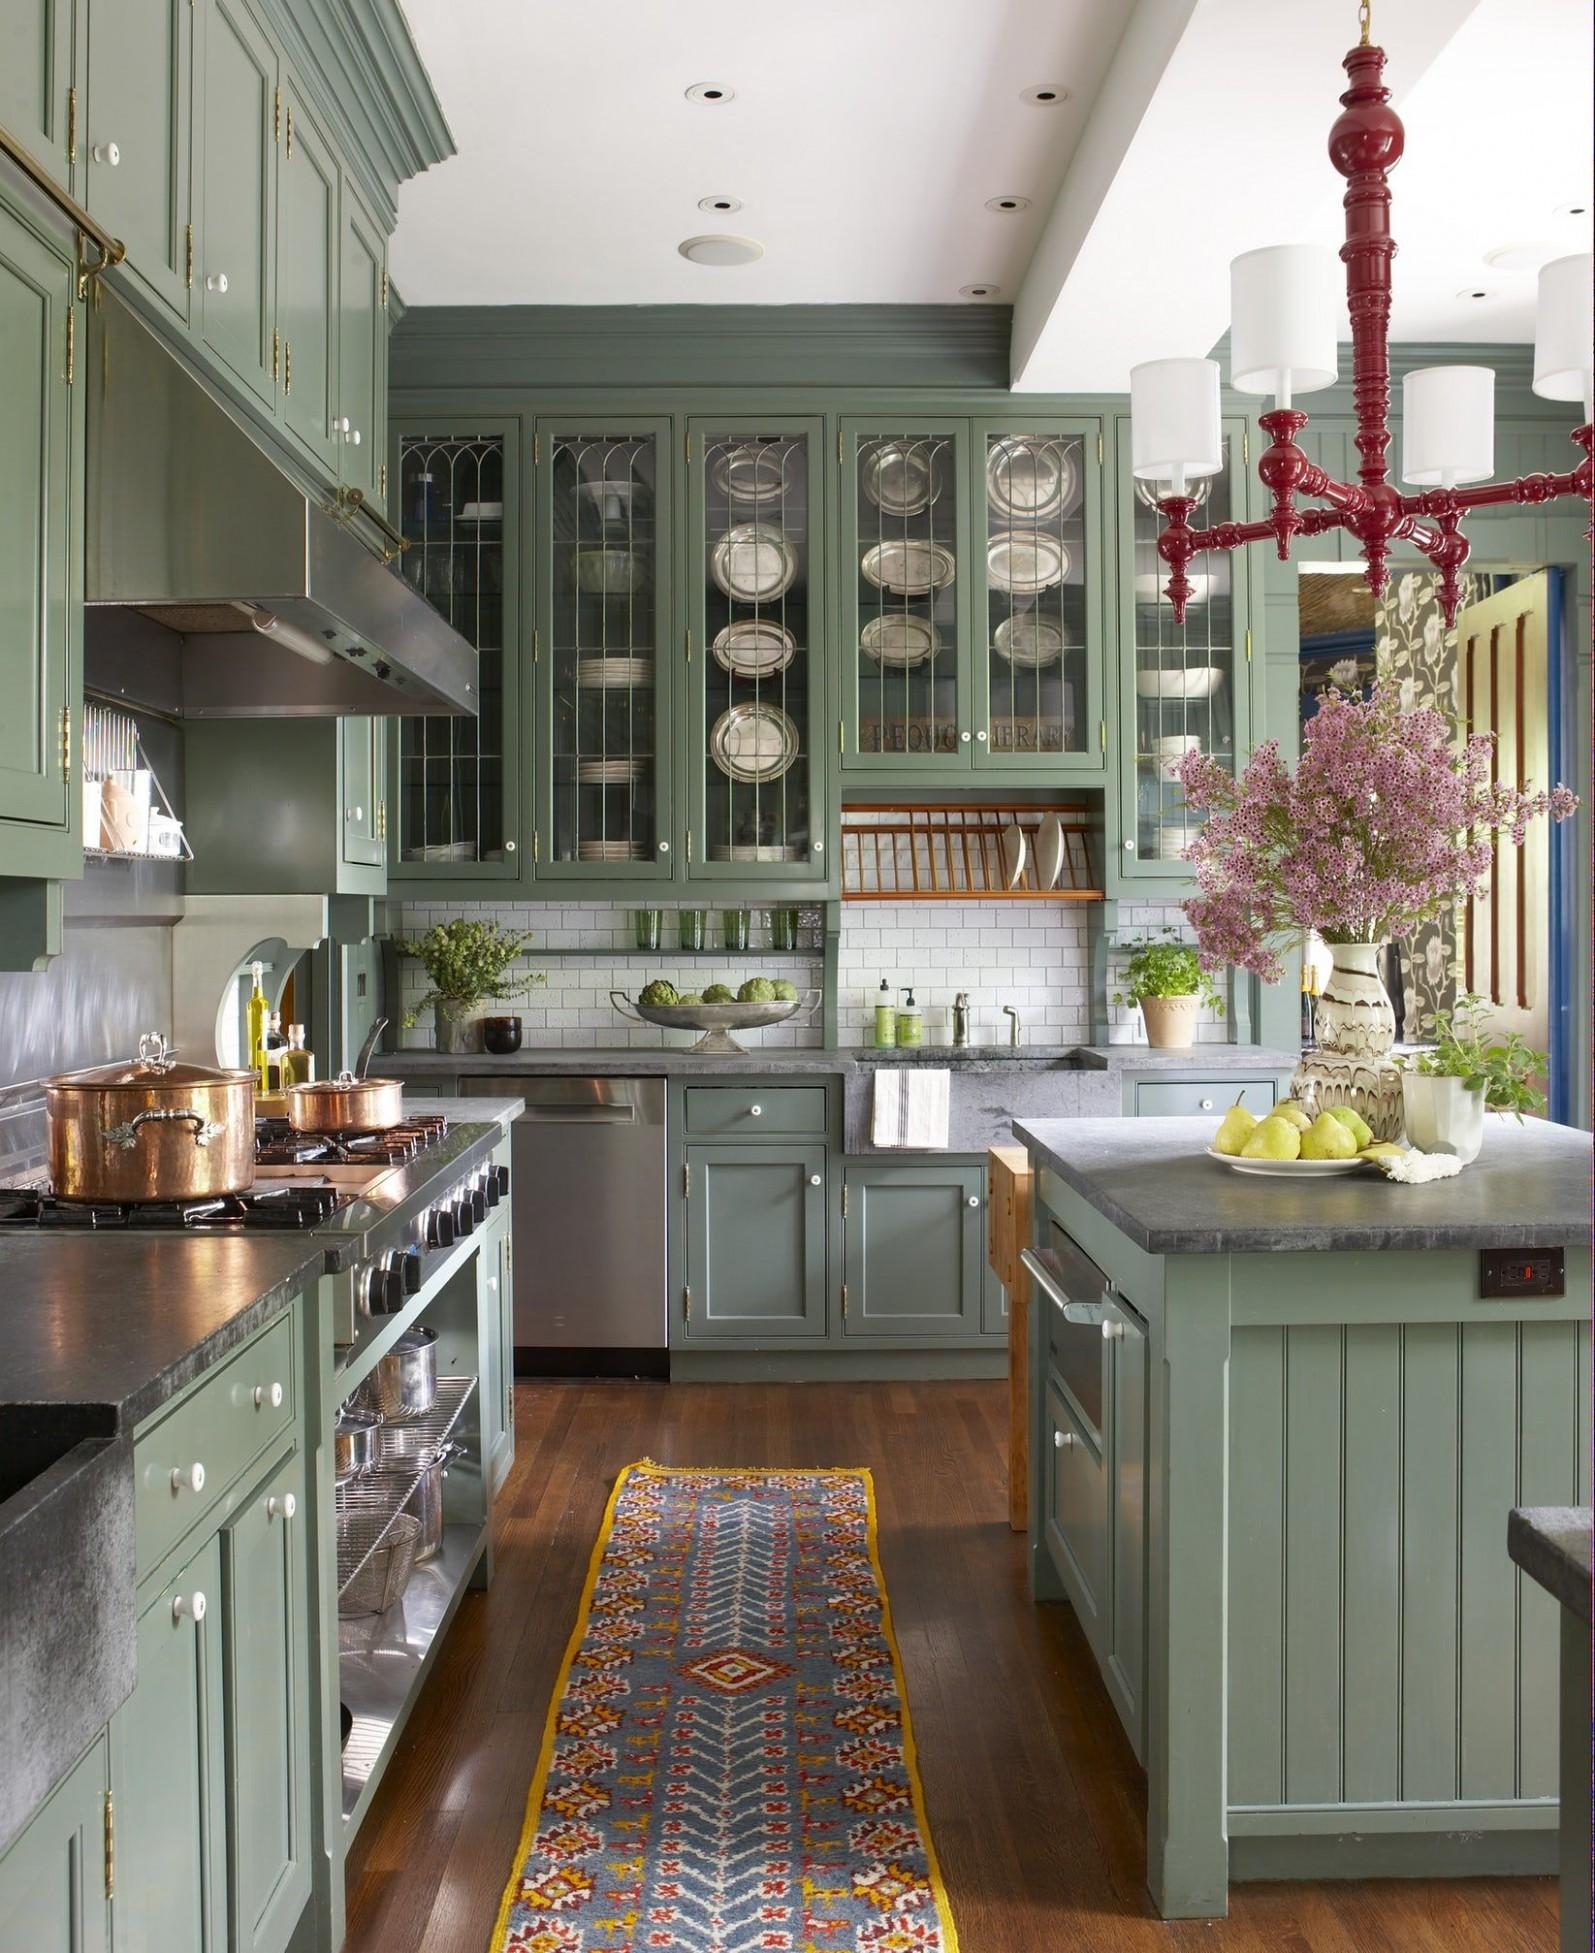 9 Green Kitchen Design Ideas - Paint Colors for Green Kitchens - Go Green Kitchen Cabinets